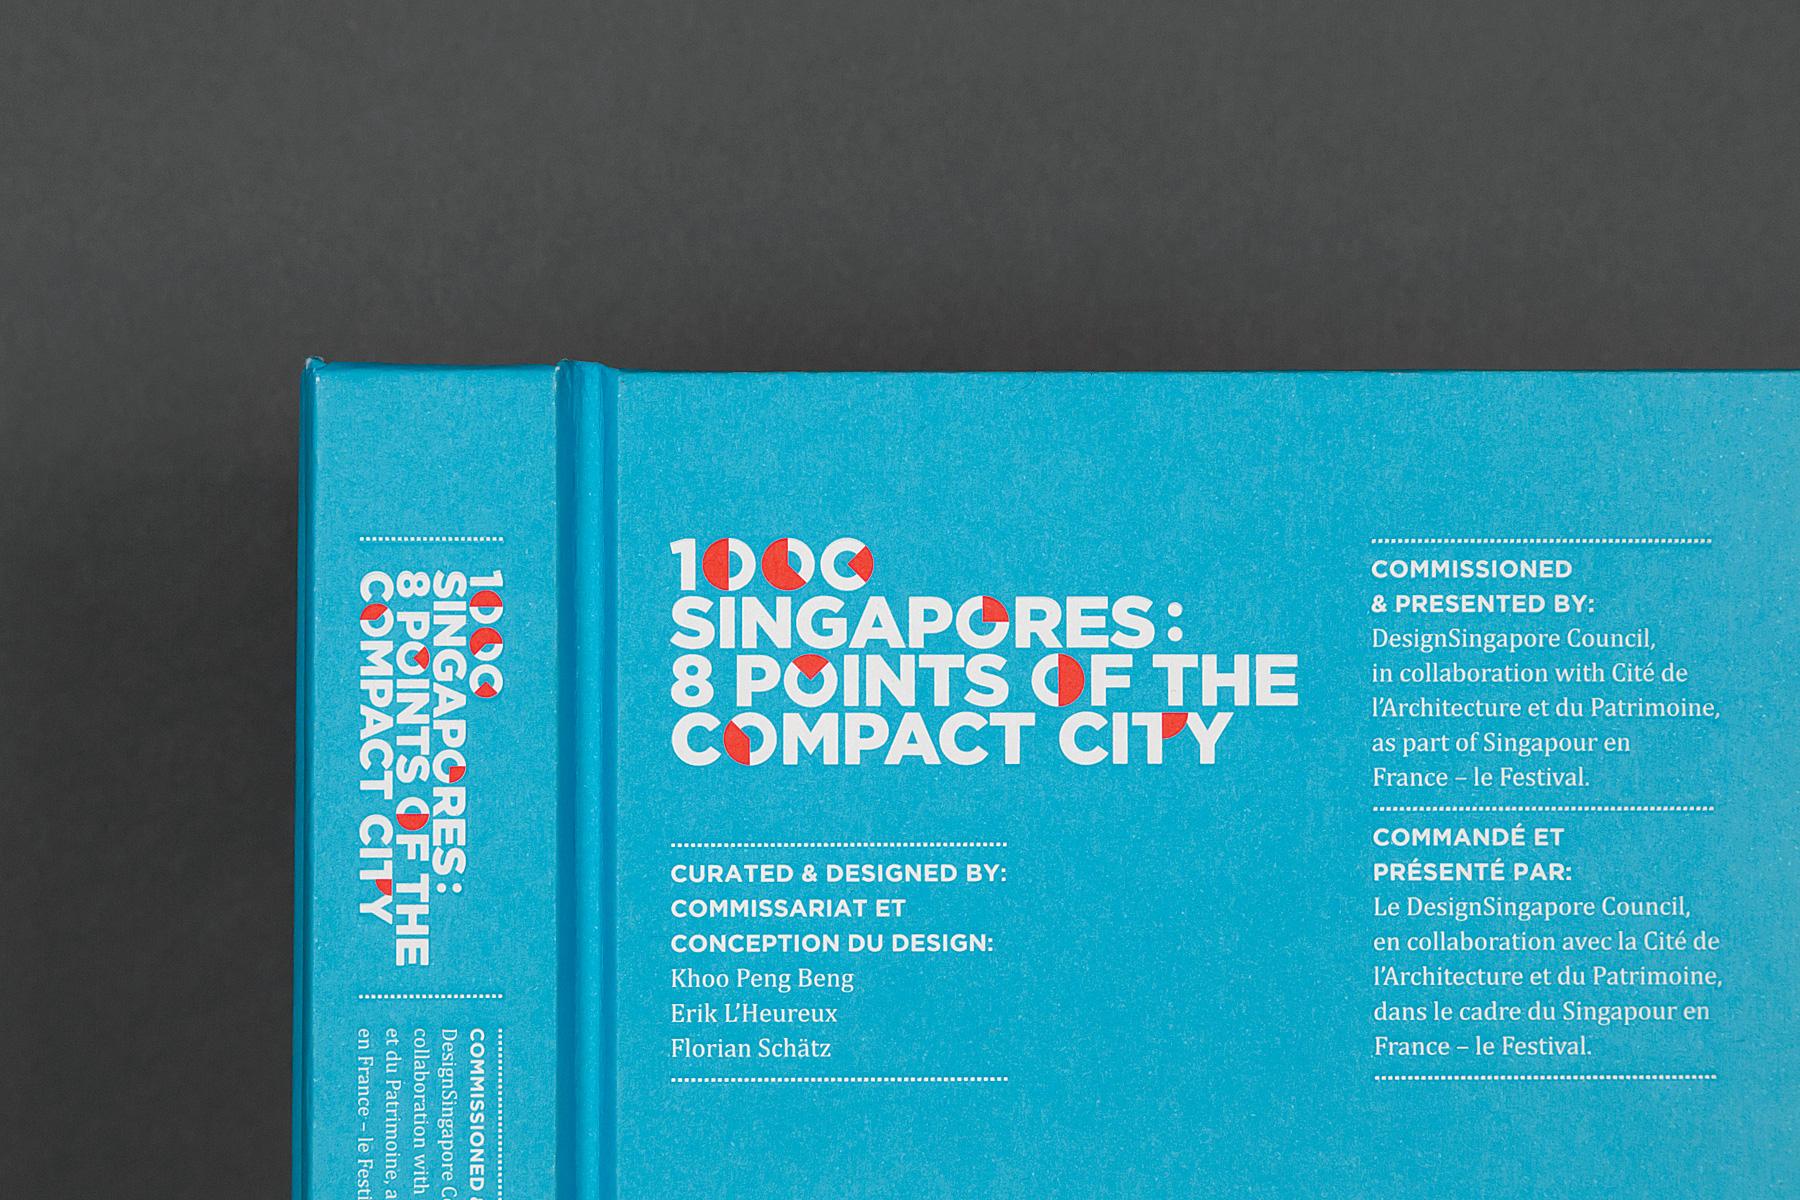 1000-Singapores-8-Points-6